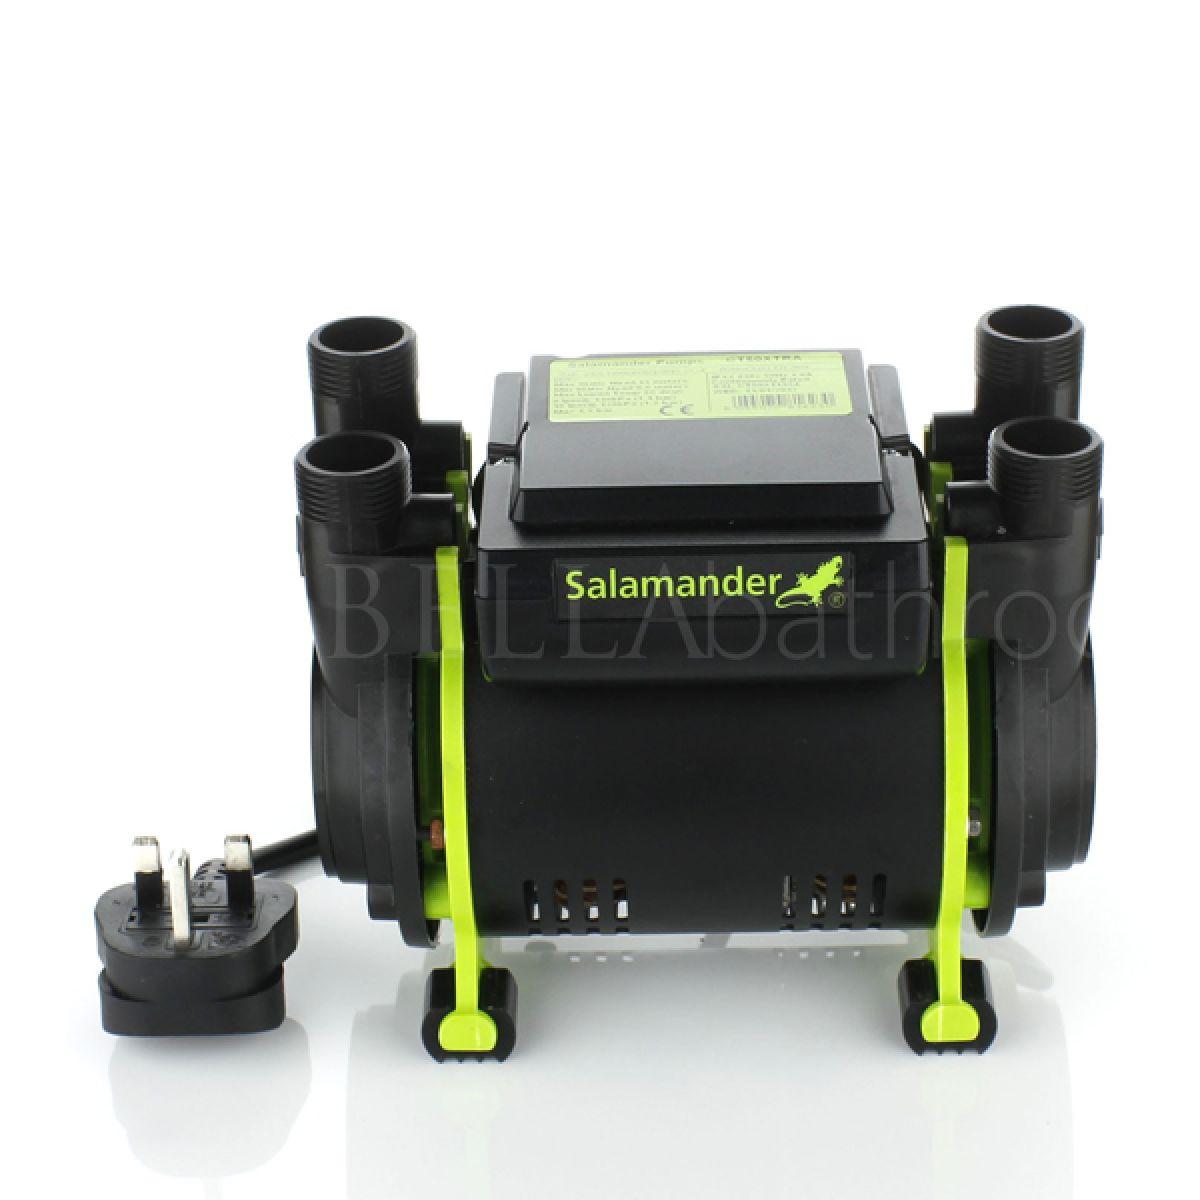 Salamander CT 50 Xtra 1.5 Bar Twin Shower Pump Front